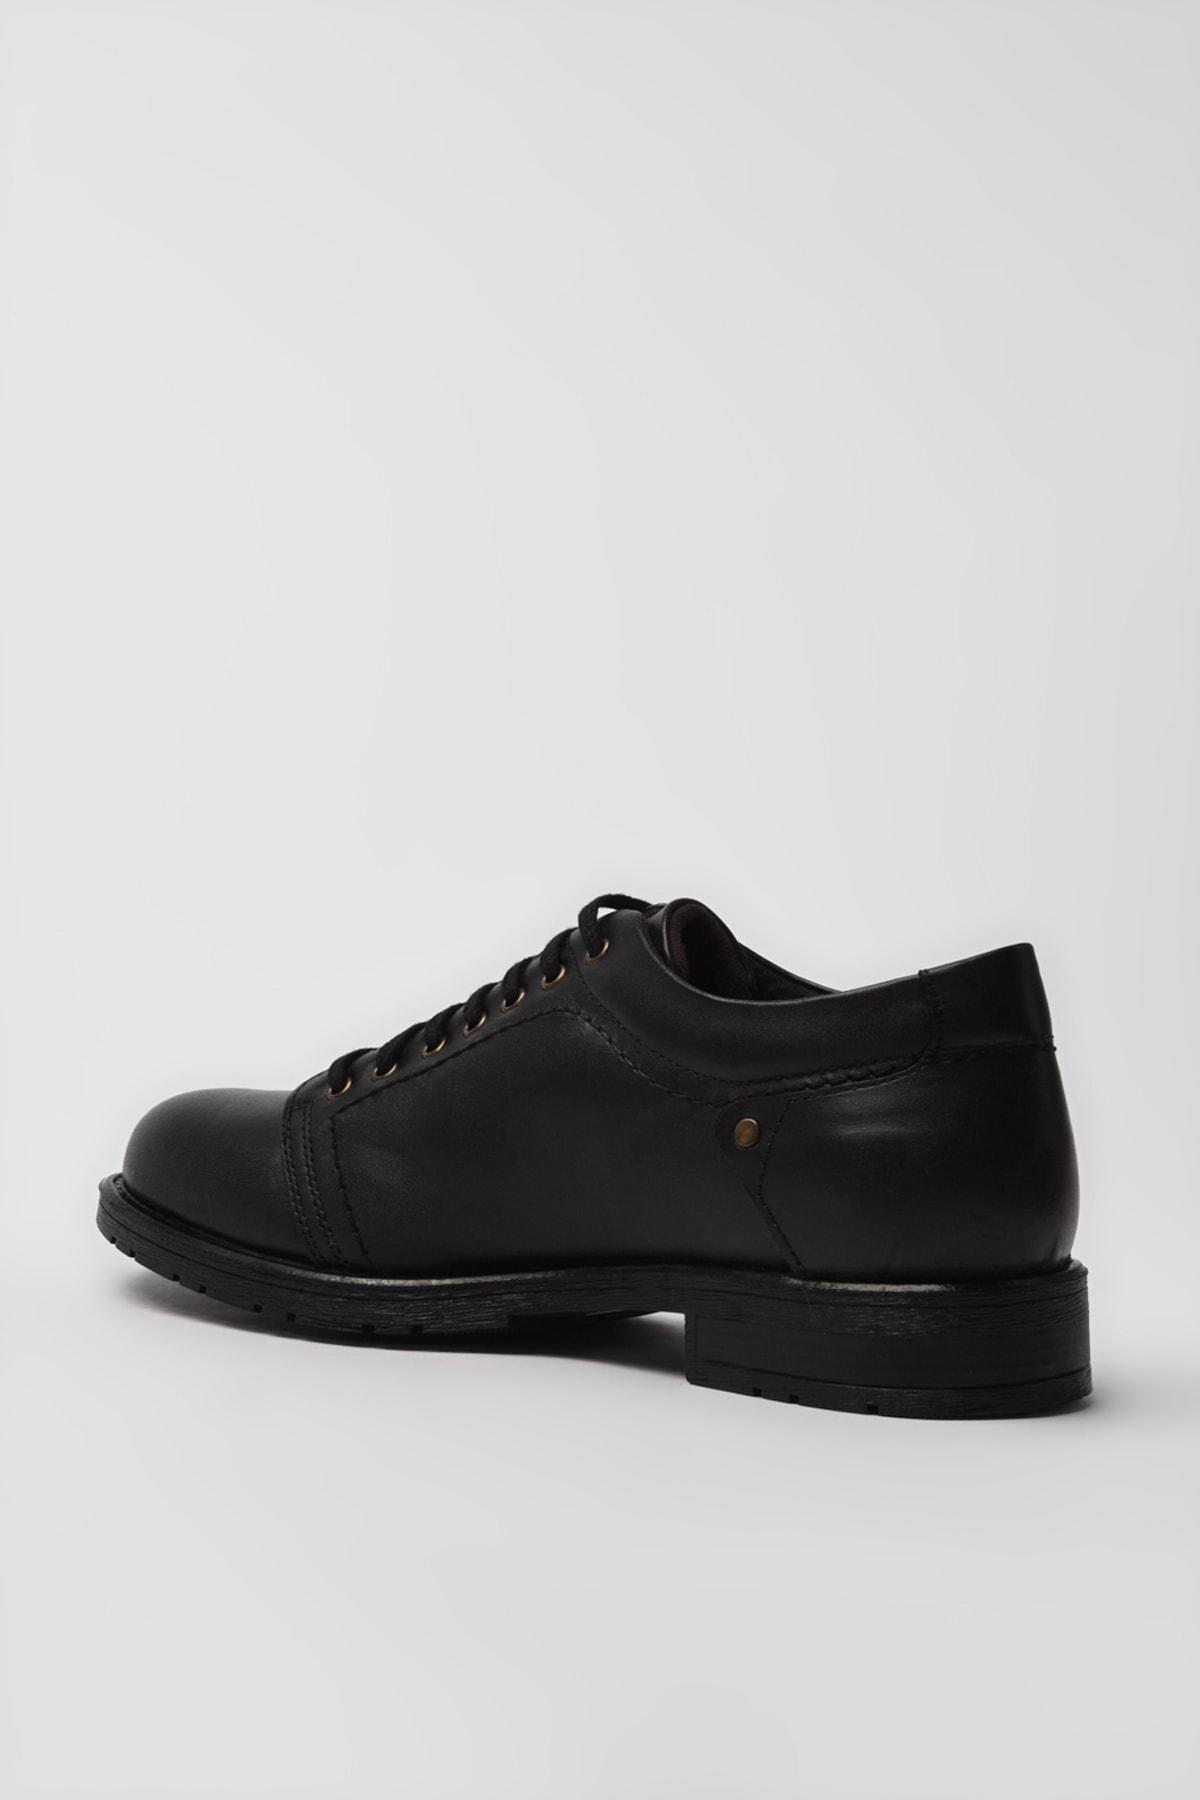 Yaya  by Hotiç Hakiki Deri Siyah Erkek Casual Ayakkabı 02AYY194960A100 2